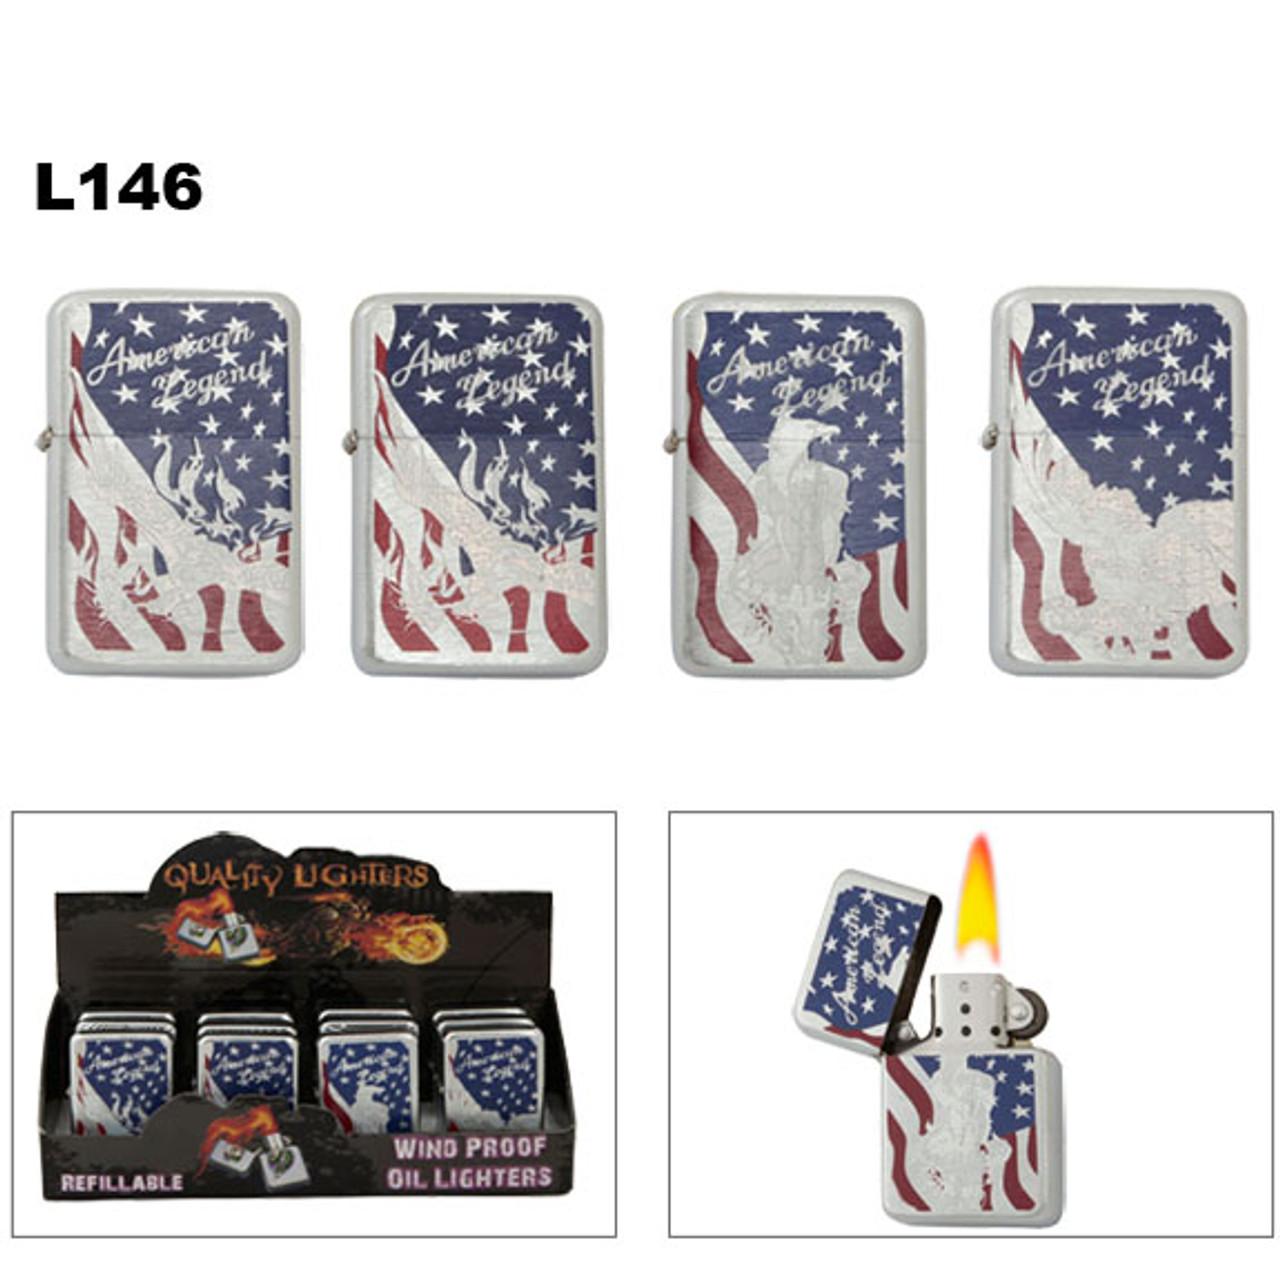 Oil Wholesale American Legend Lighters